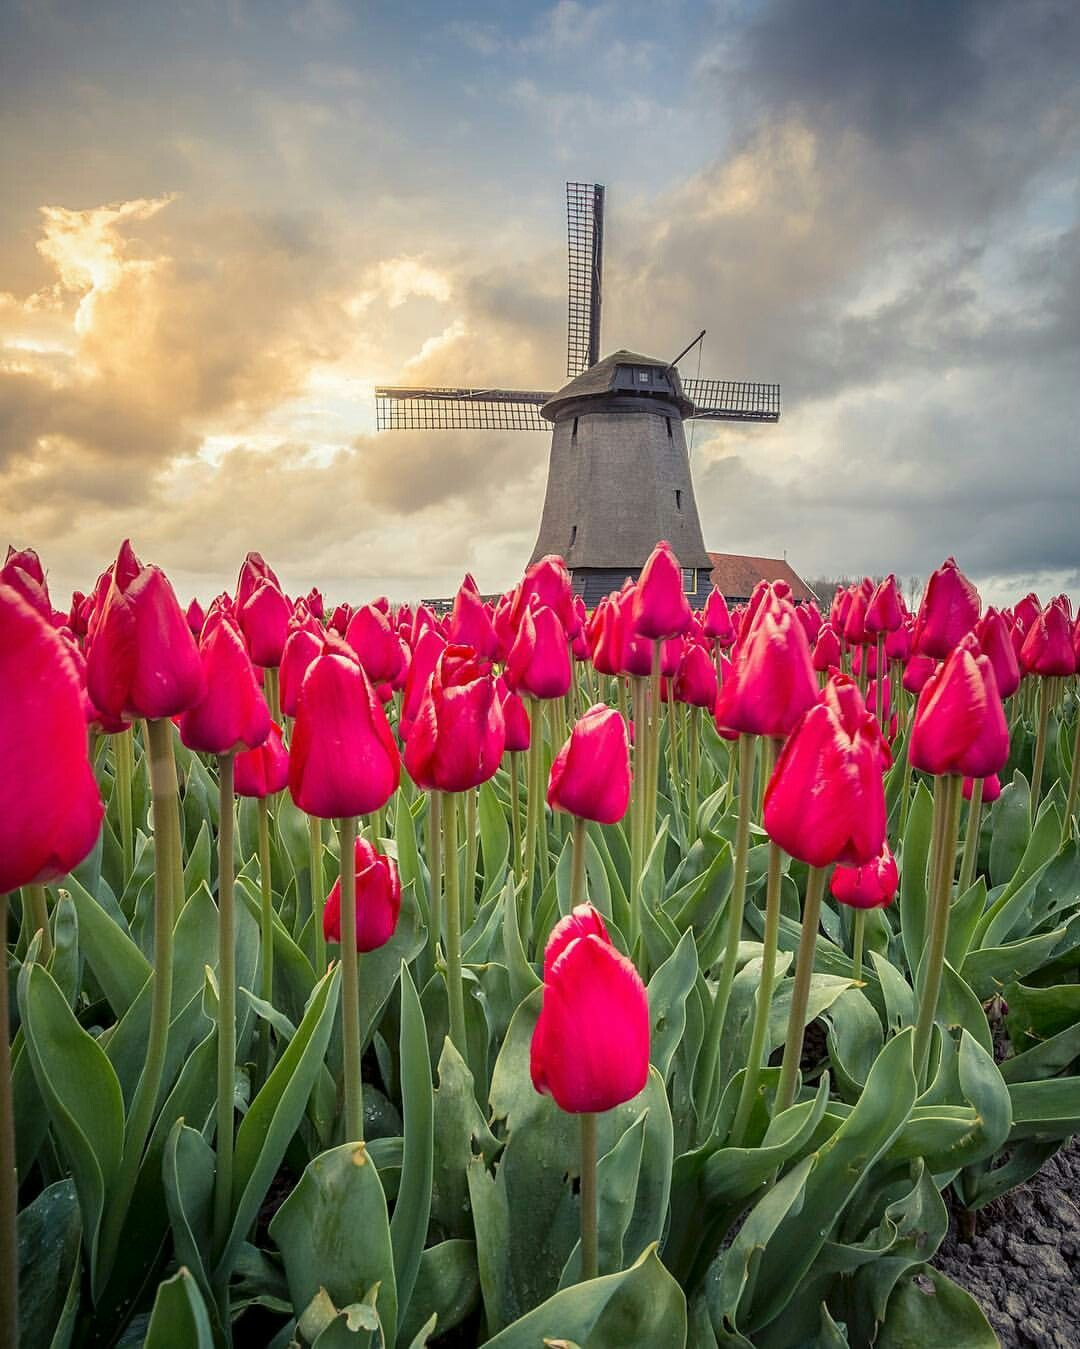 Tulip Field Netherlands Tulip Fields Netherlands Tulip Fields Amsterdam Tulips